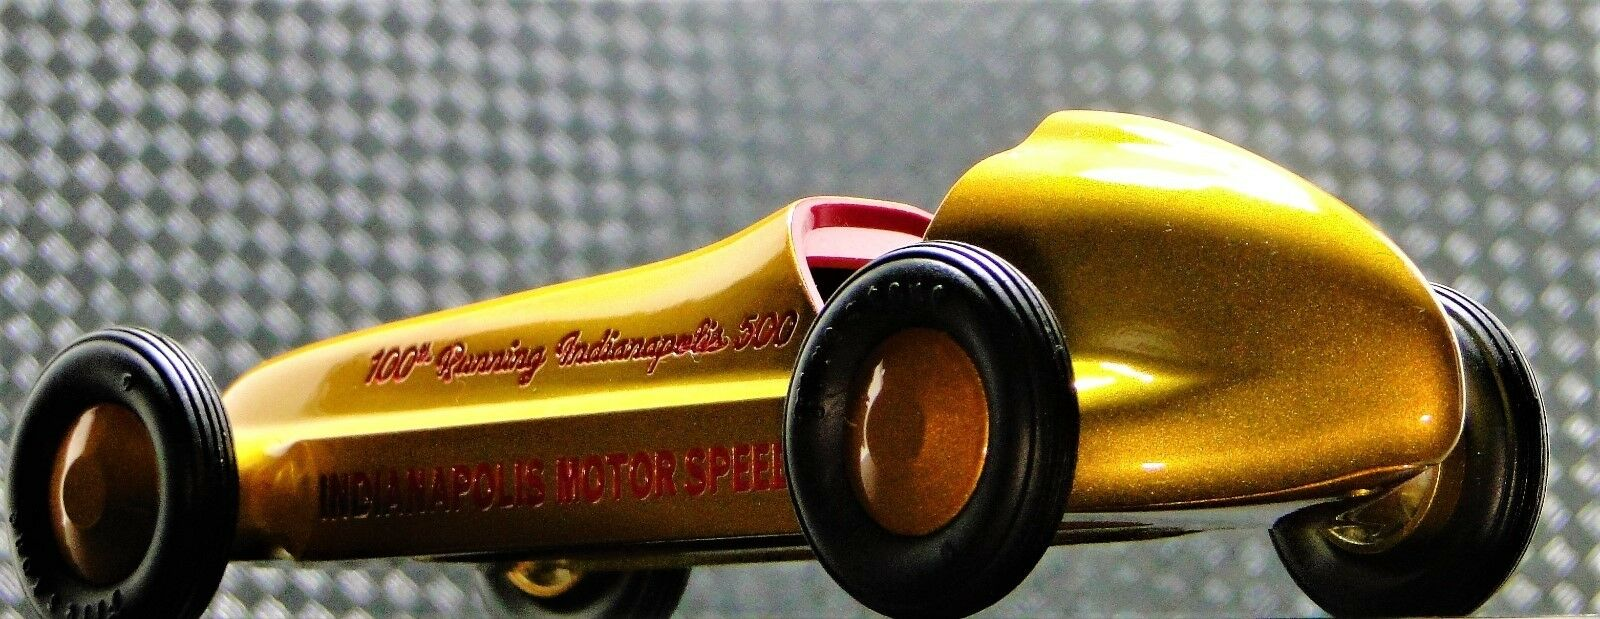 Tether Racer Vintage Midget Race Car GP F Indy 500 1 18 Carousel oro Metal 12